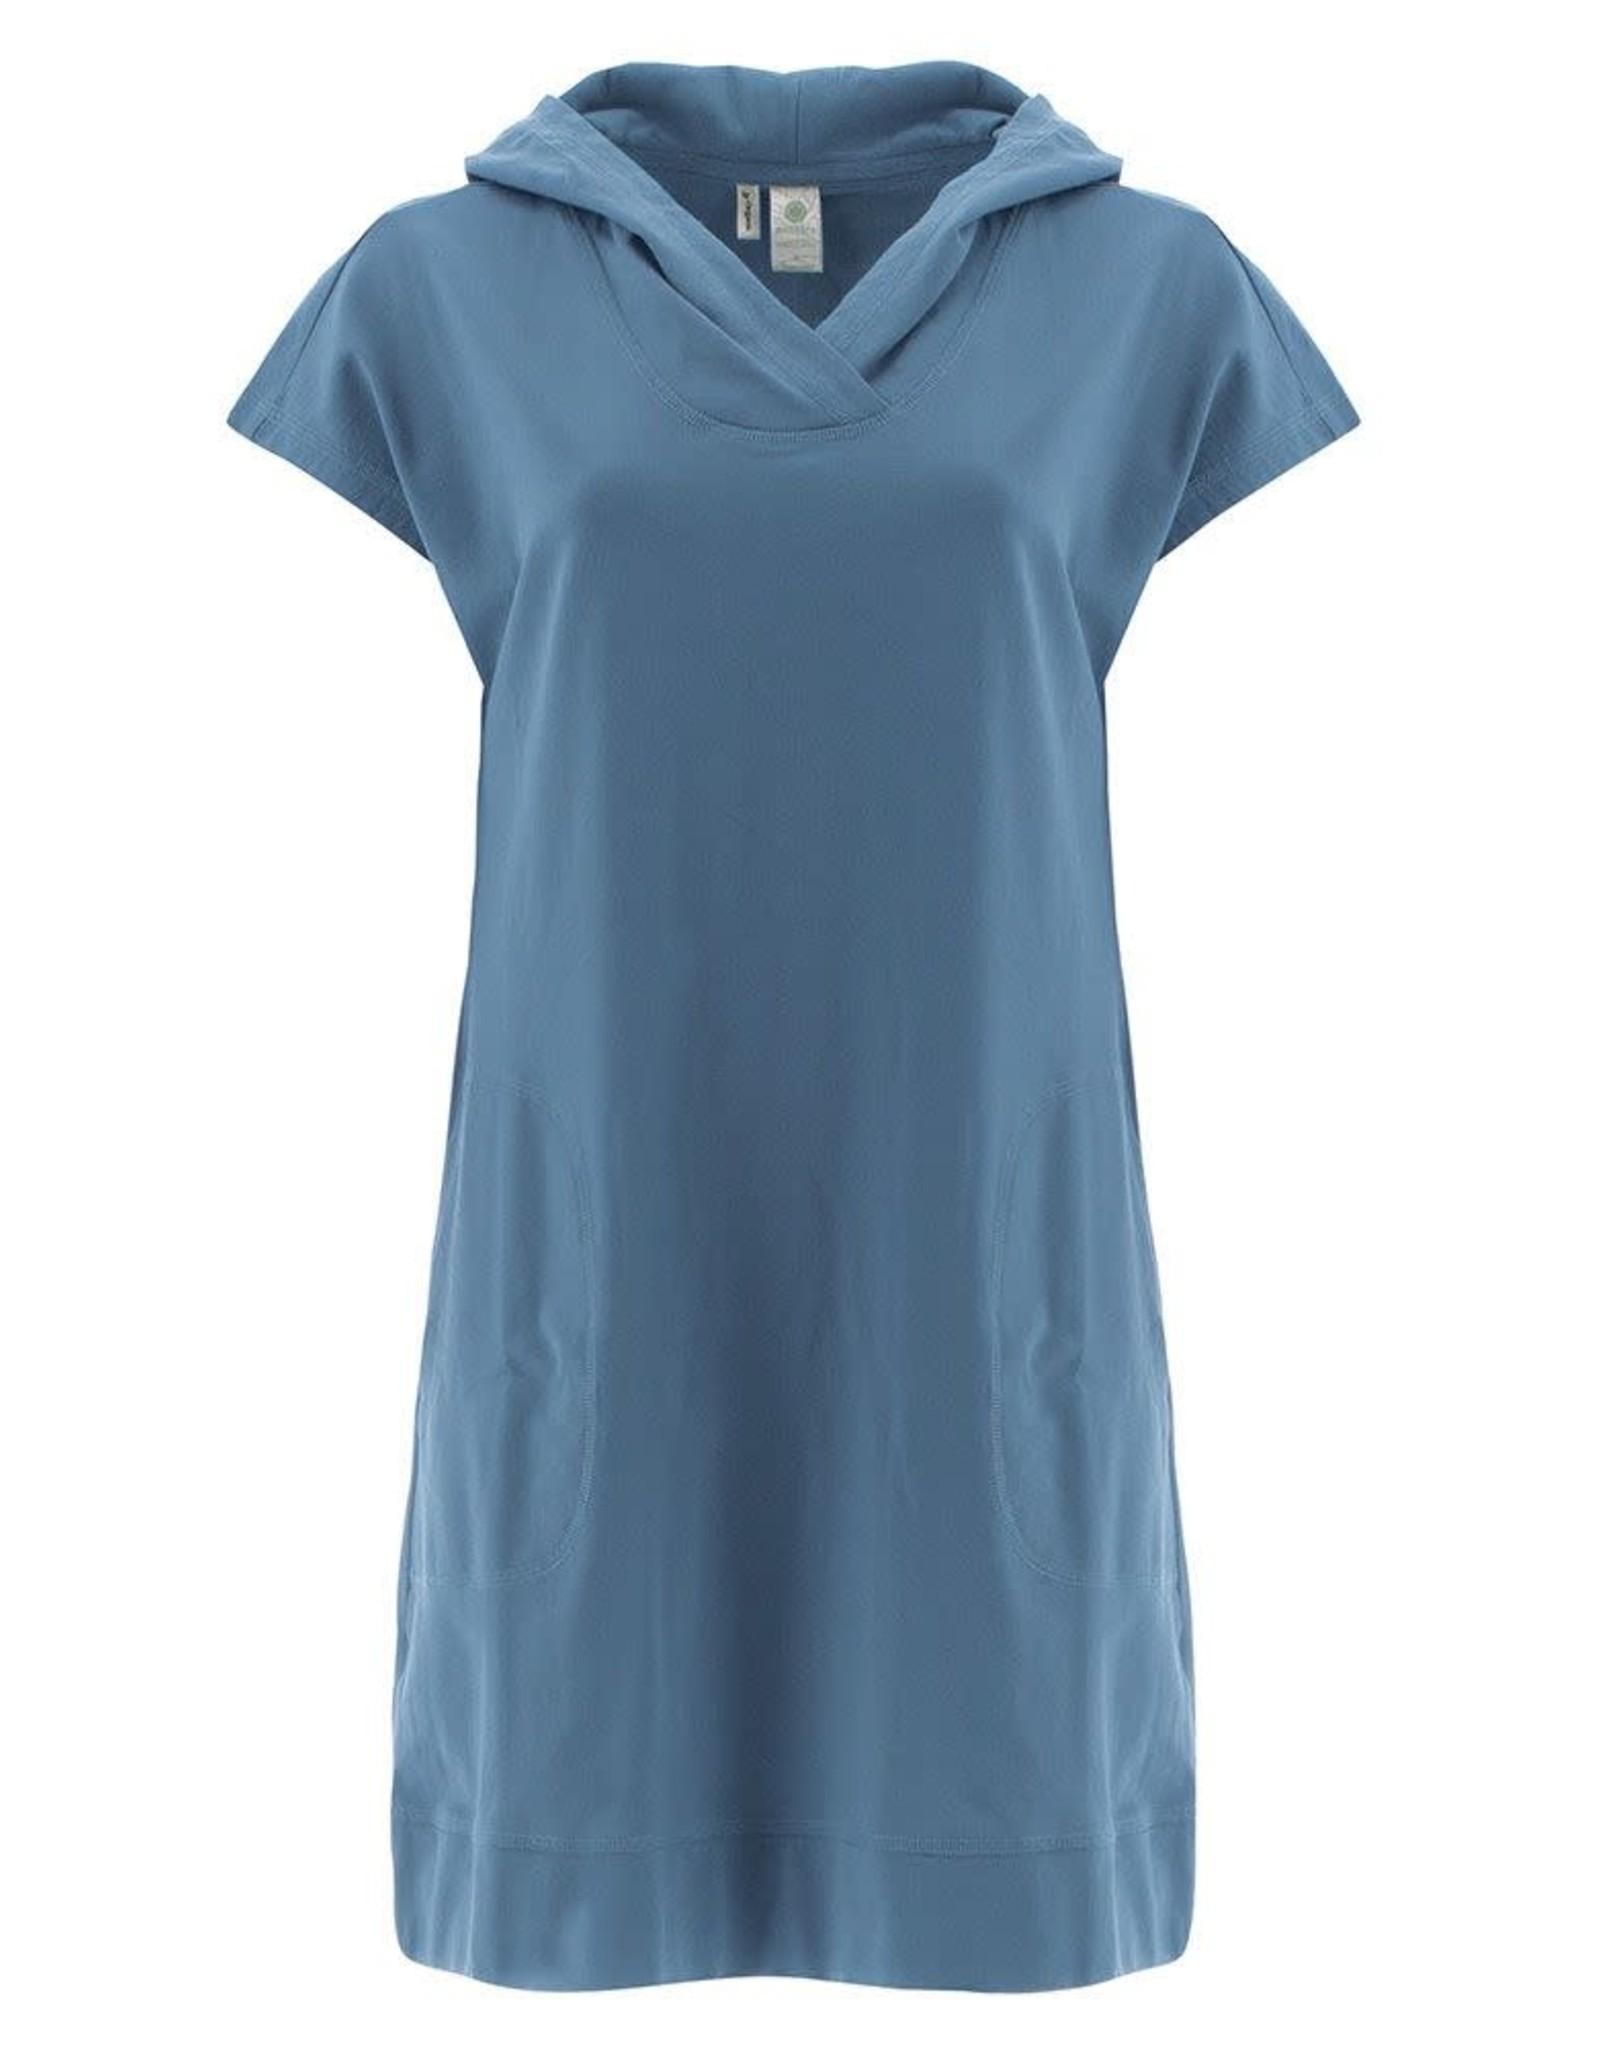 - Blue Hoodie Dress w/Pockets